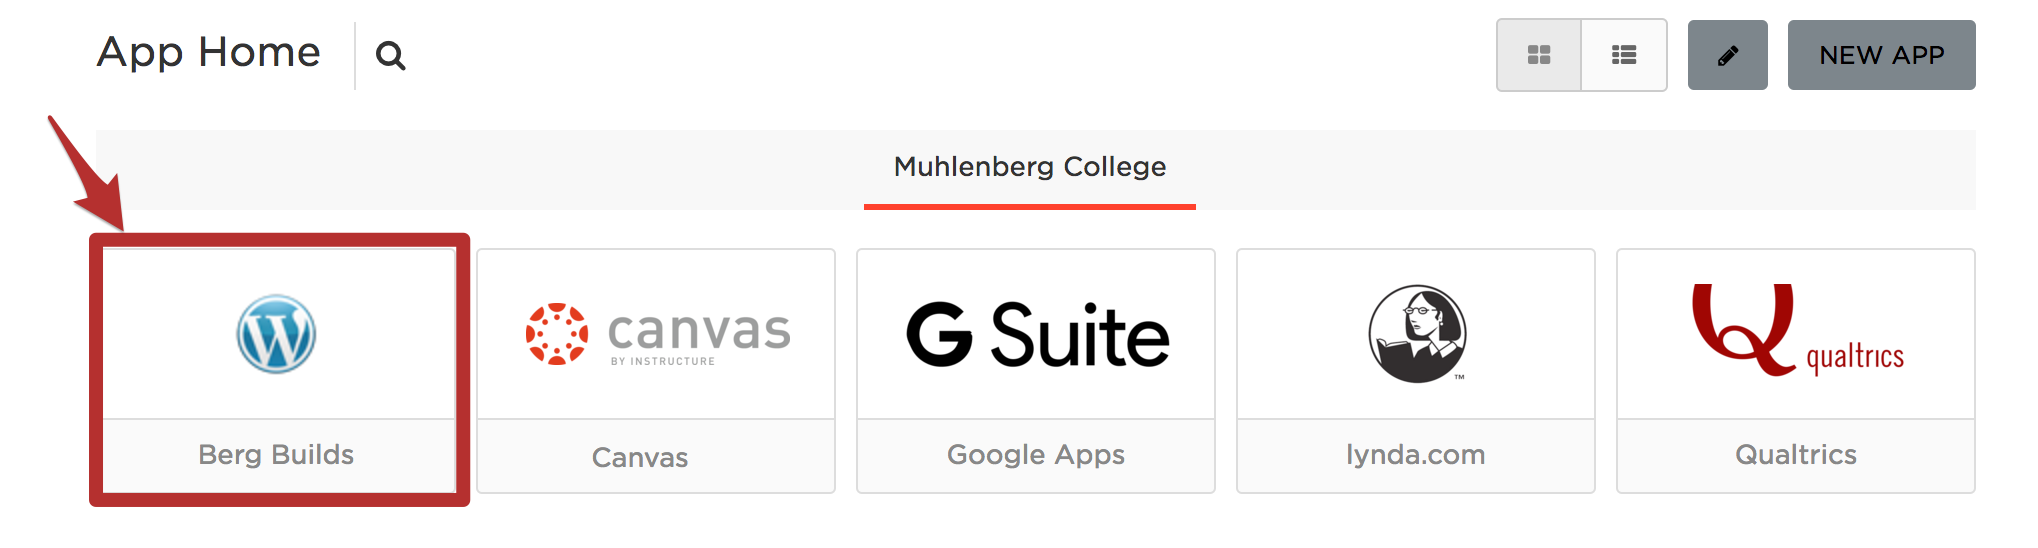 Muhlenberg's One Login Application Portal and Bergbuilds Icon